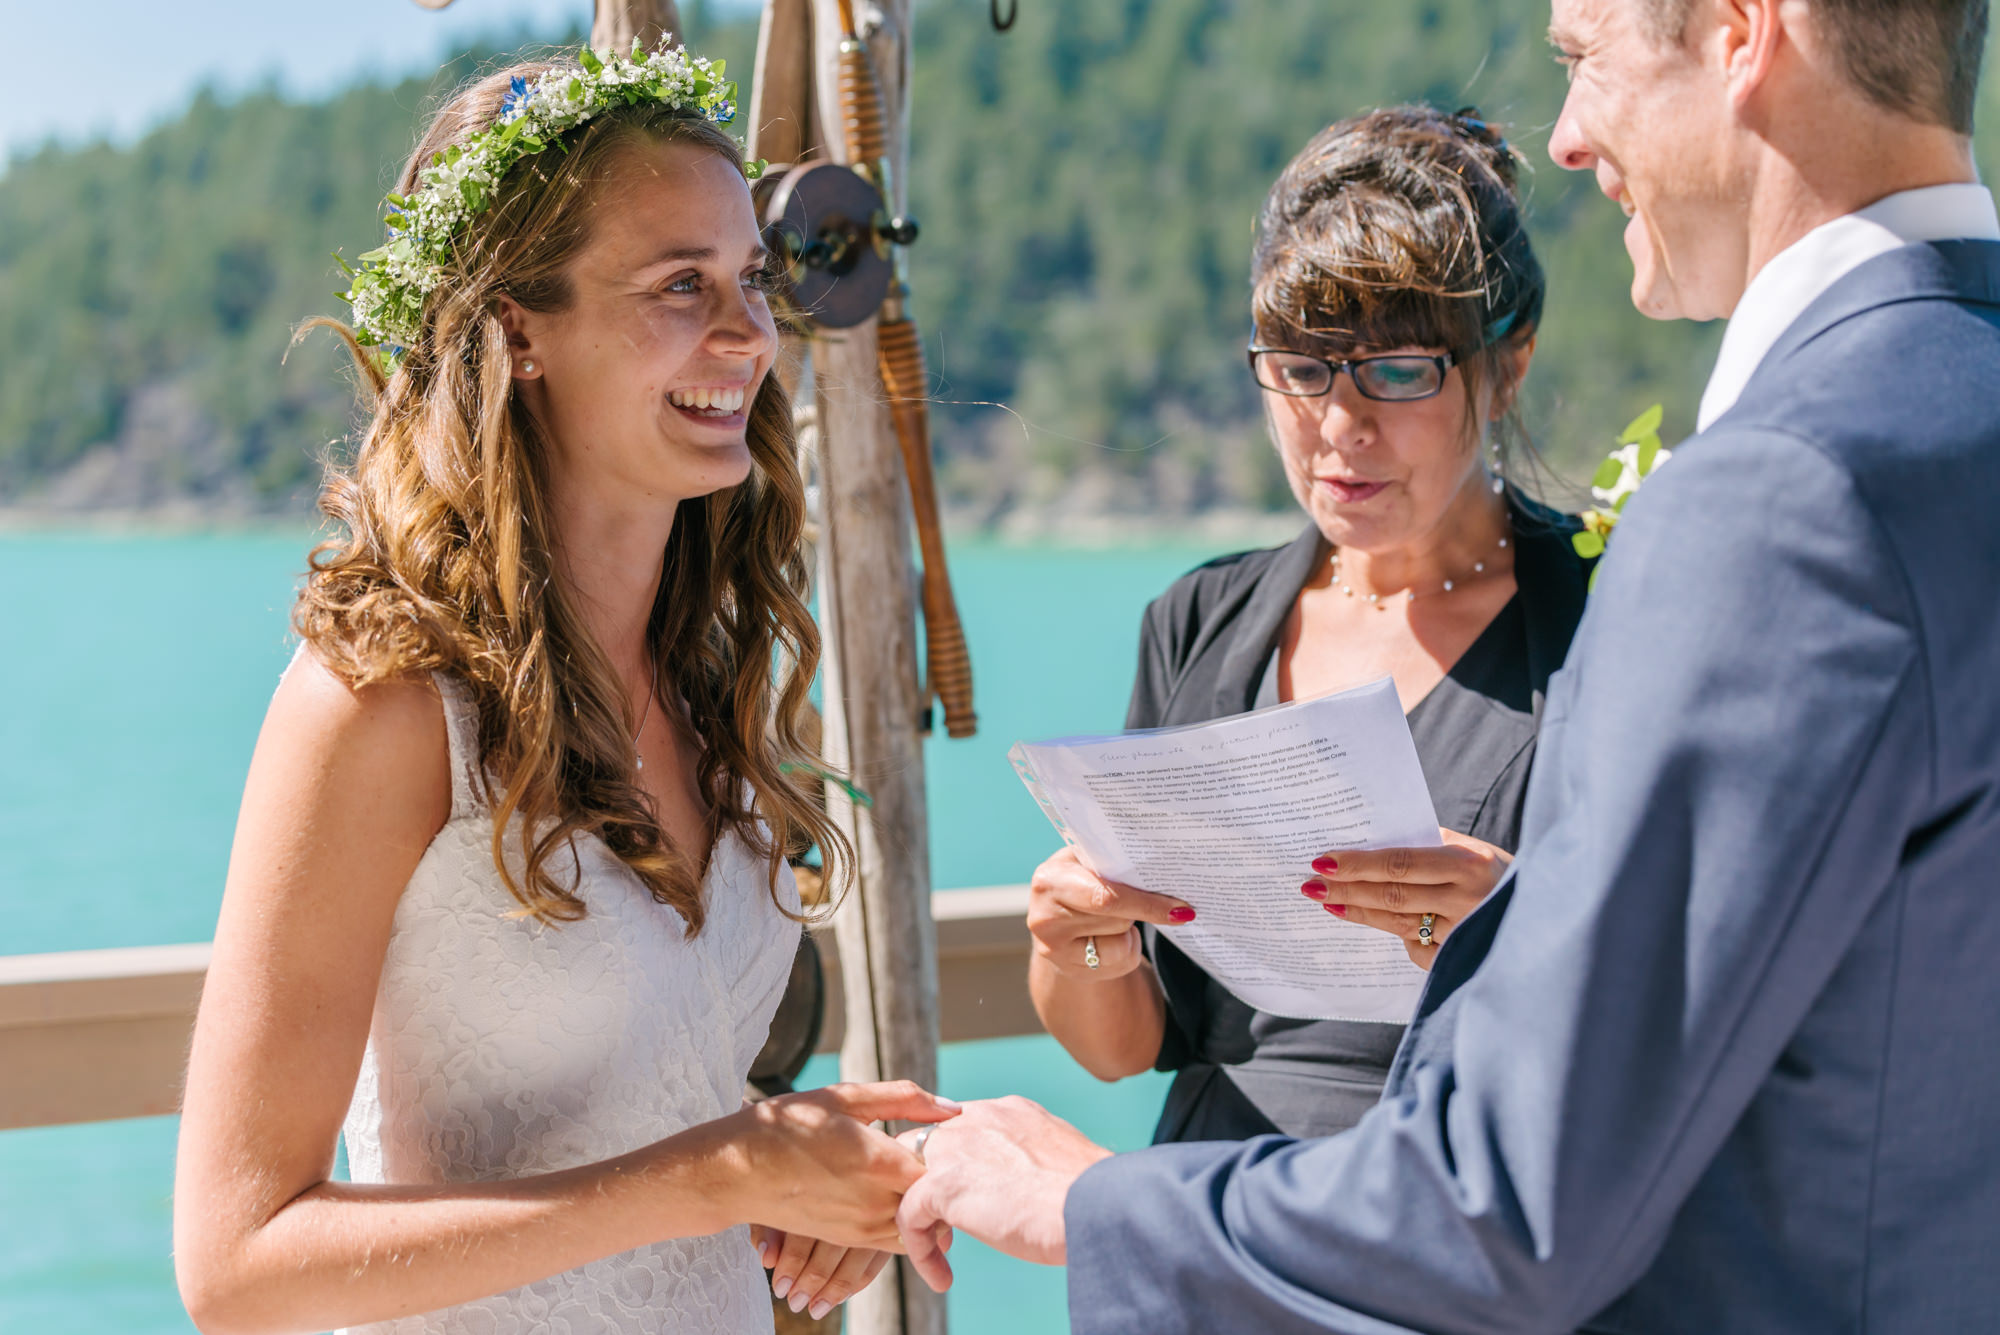 bowen_island_wedding_photographer_vancouver142835_18_ally&james.jpg